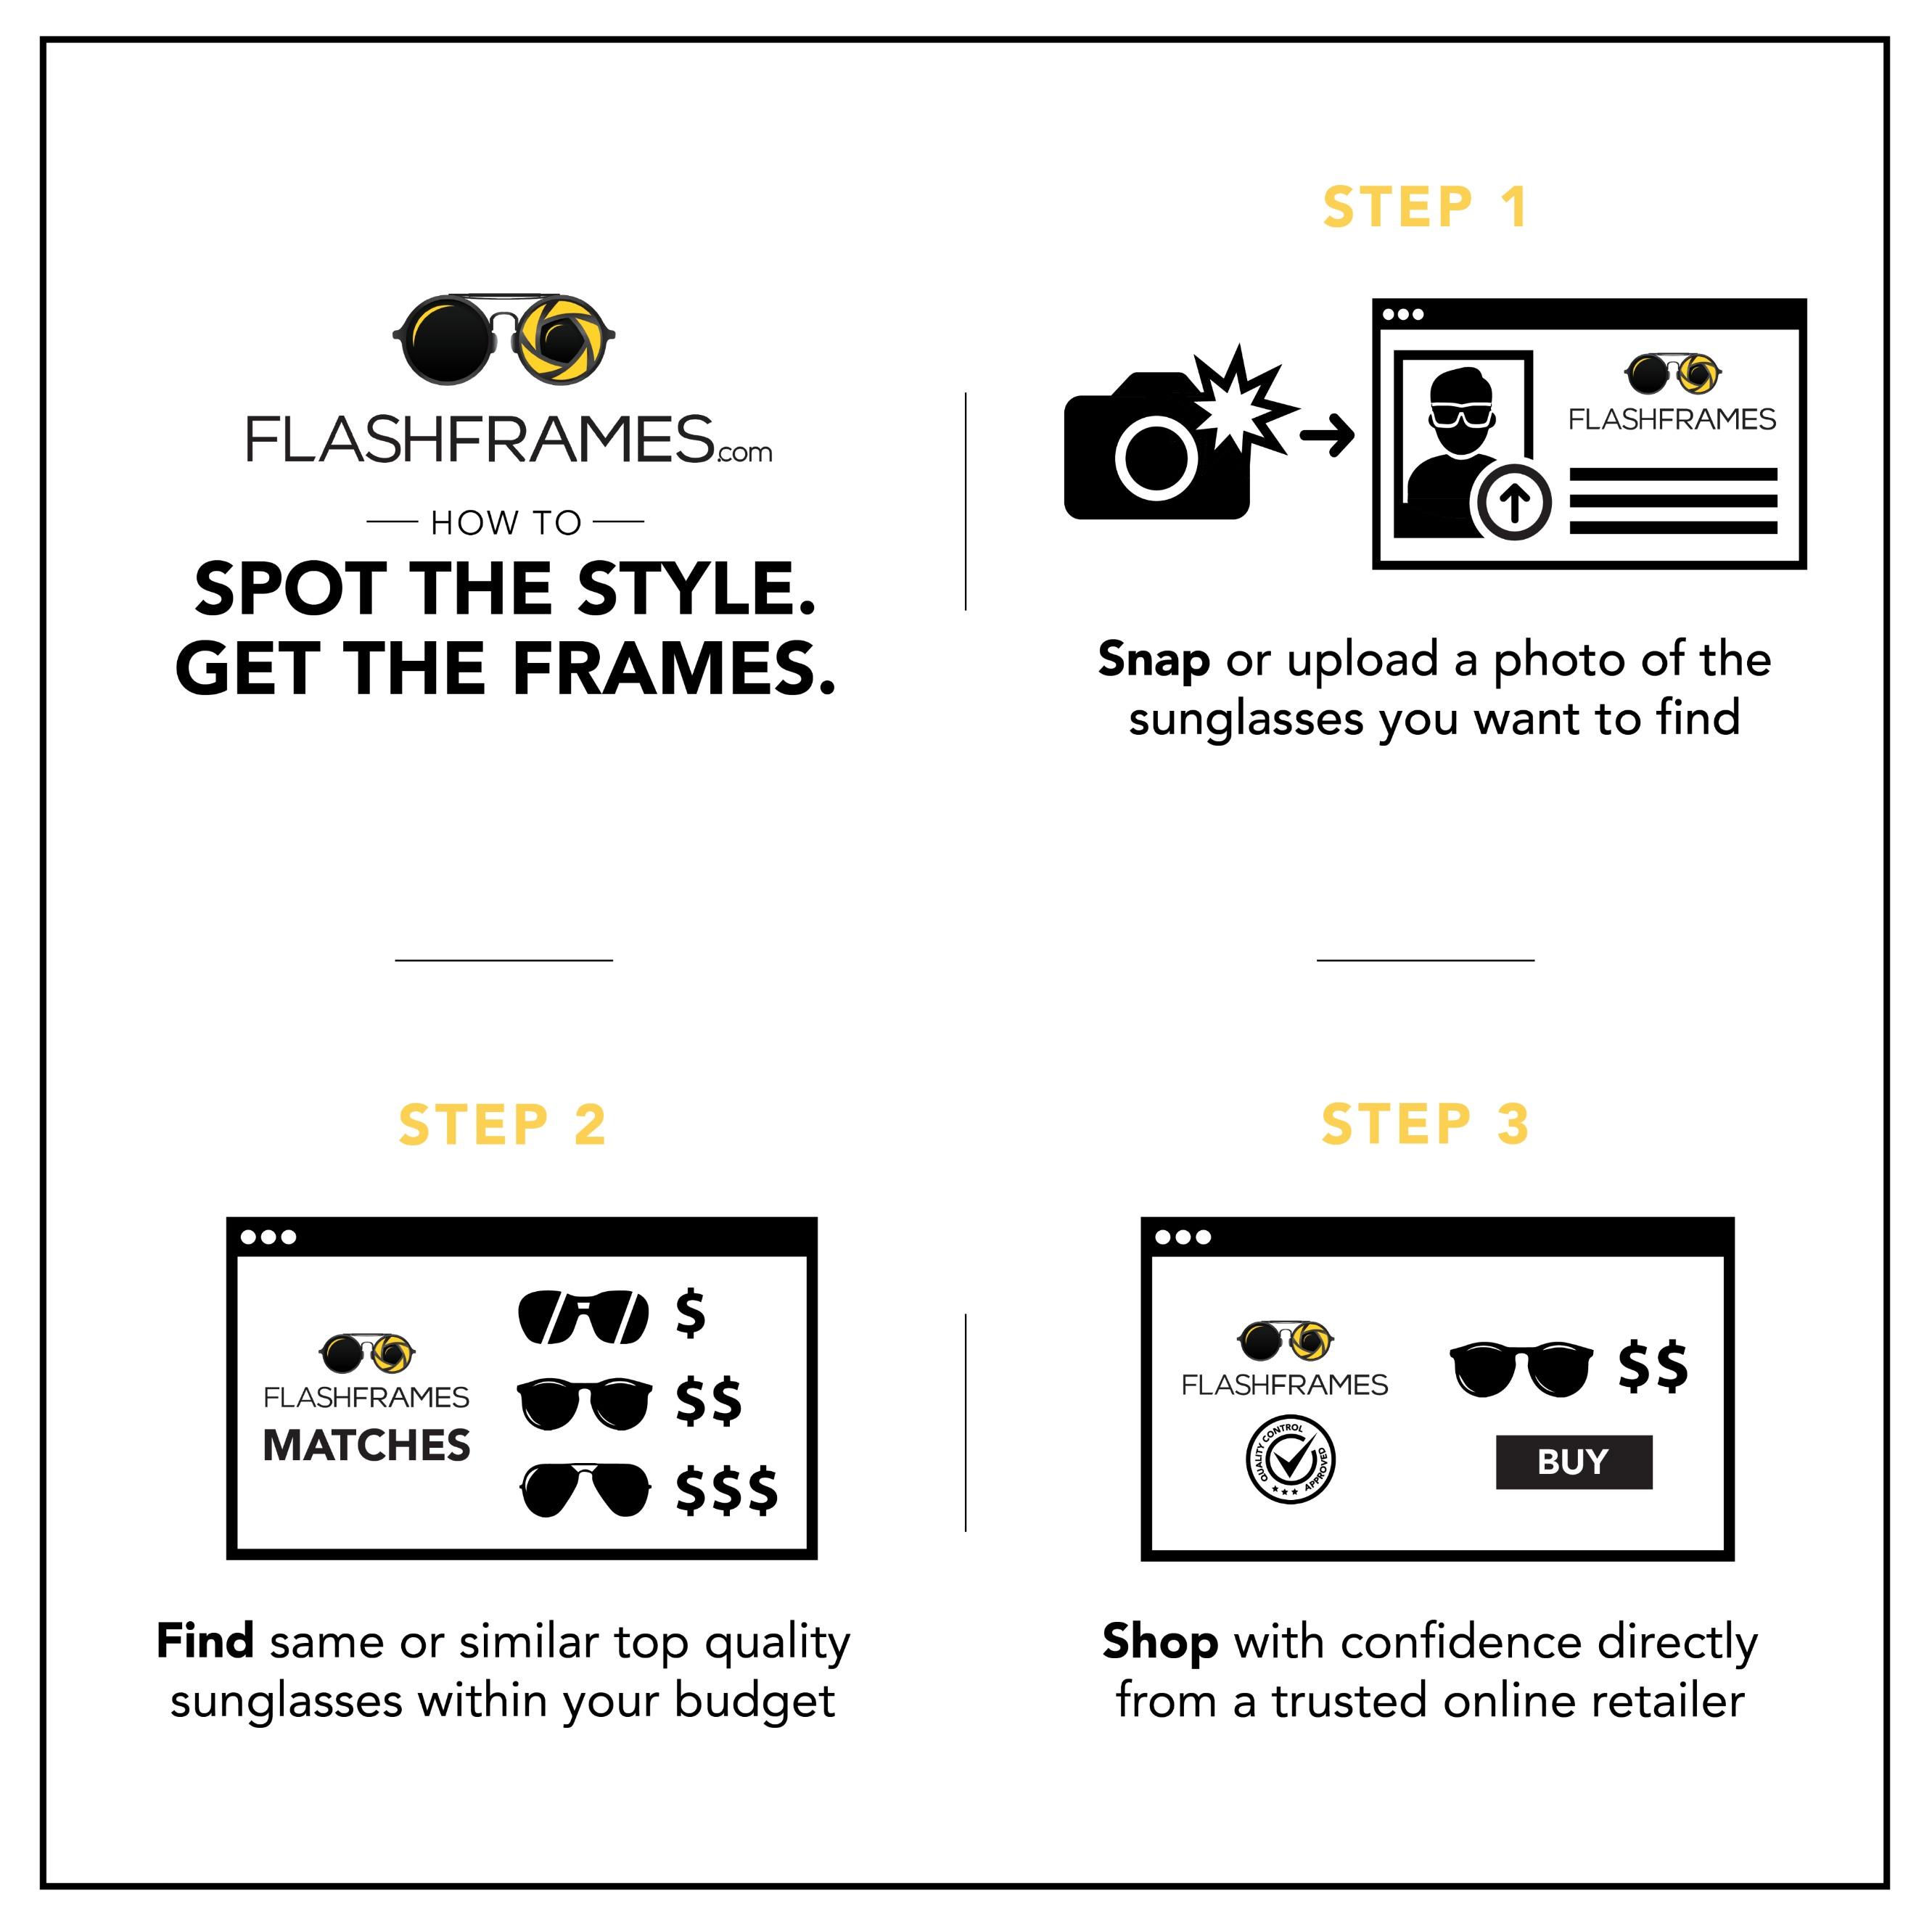 FlashFrames